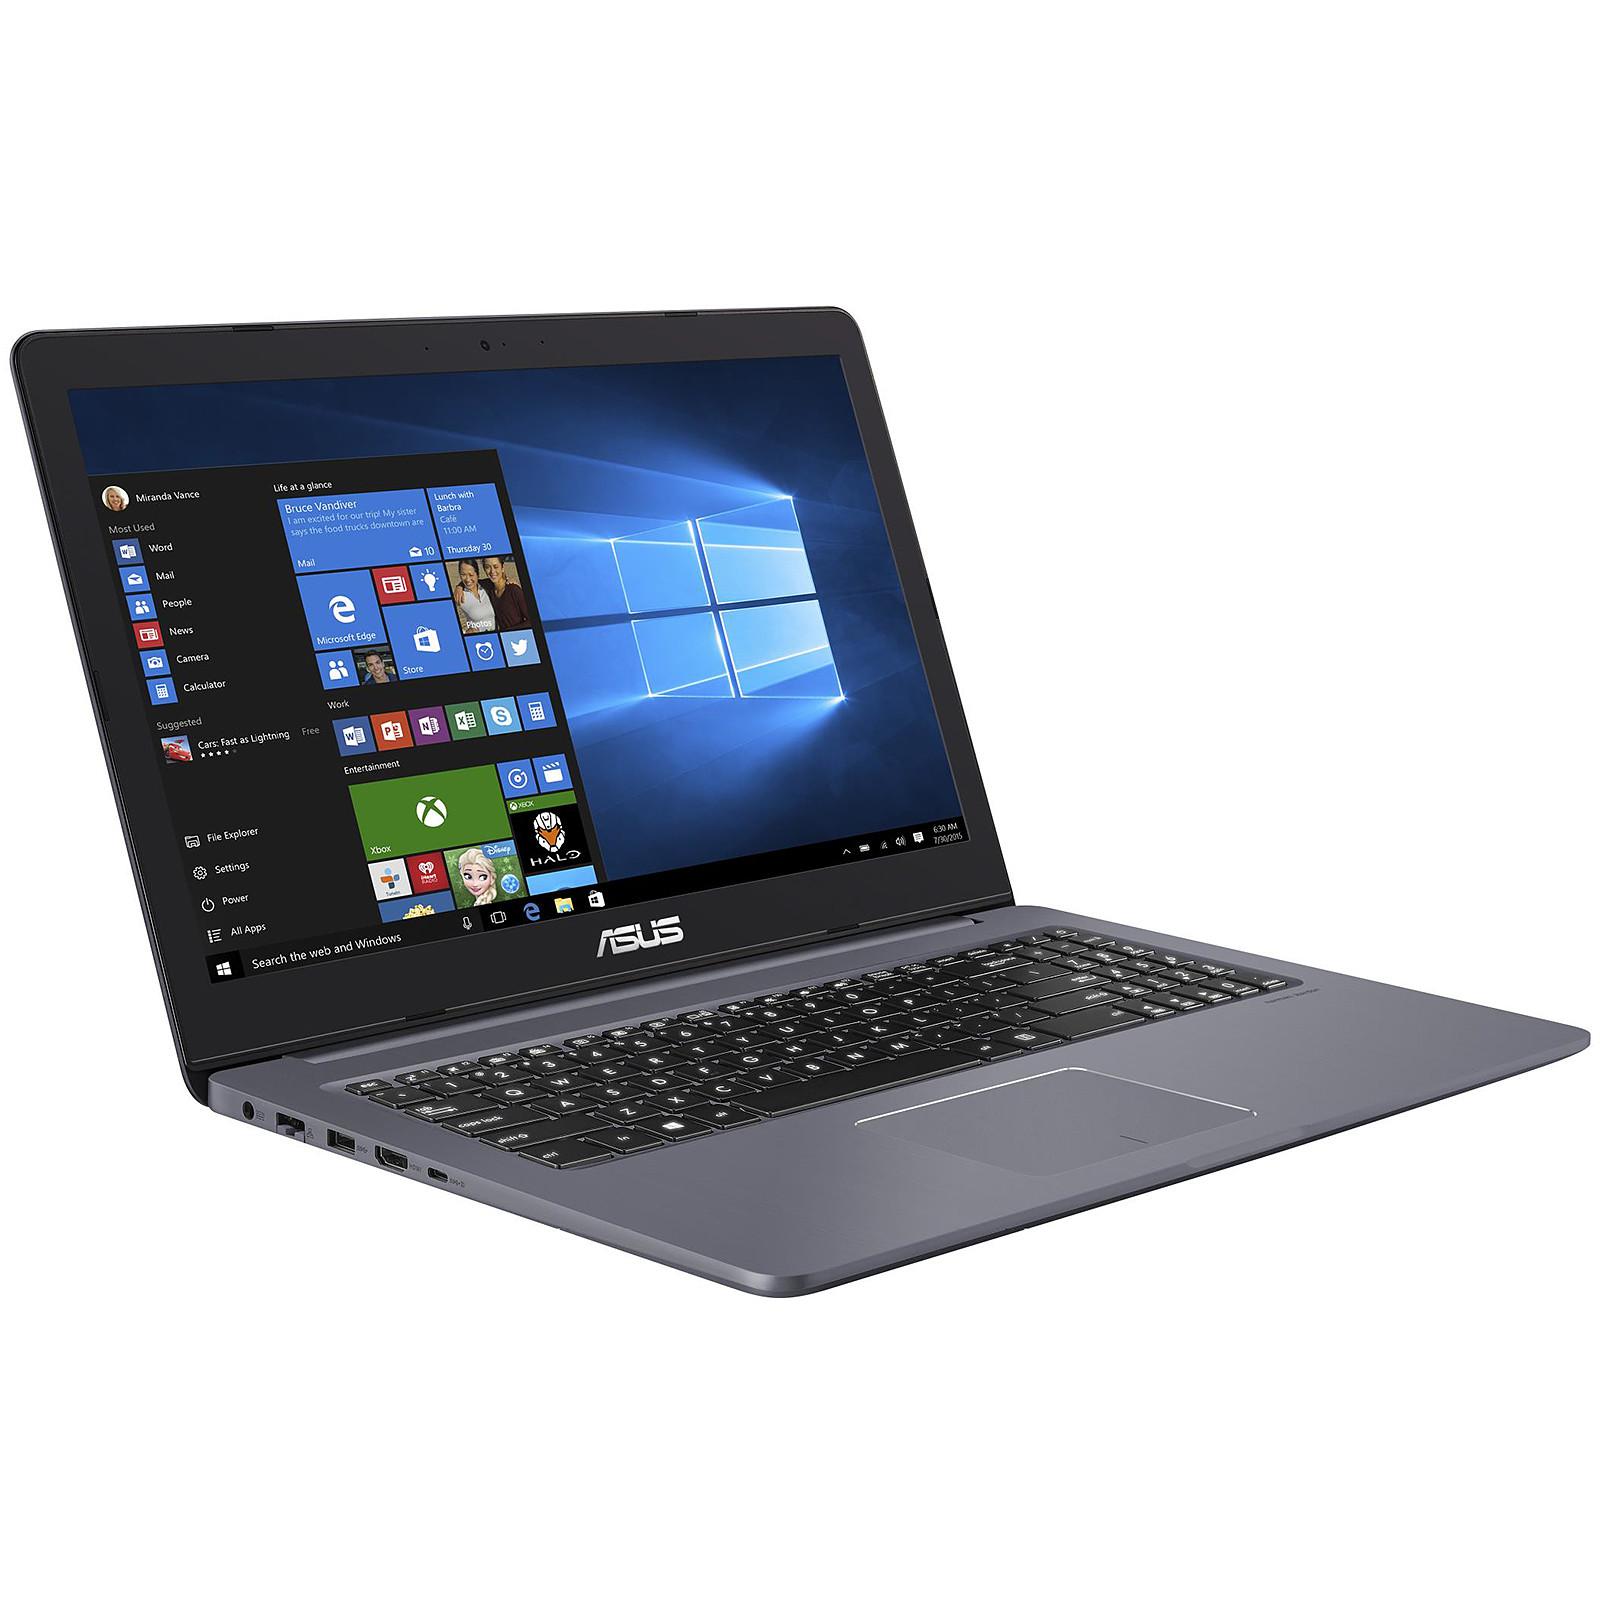 ASUS VivoBook Pro 15 NX580VD-FI667R